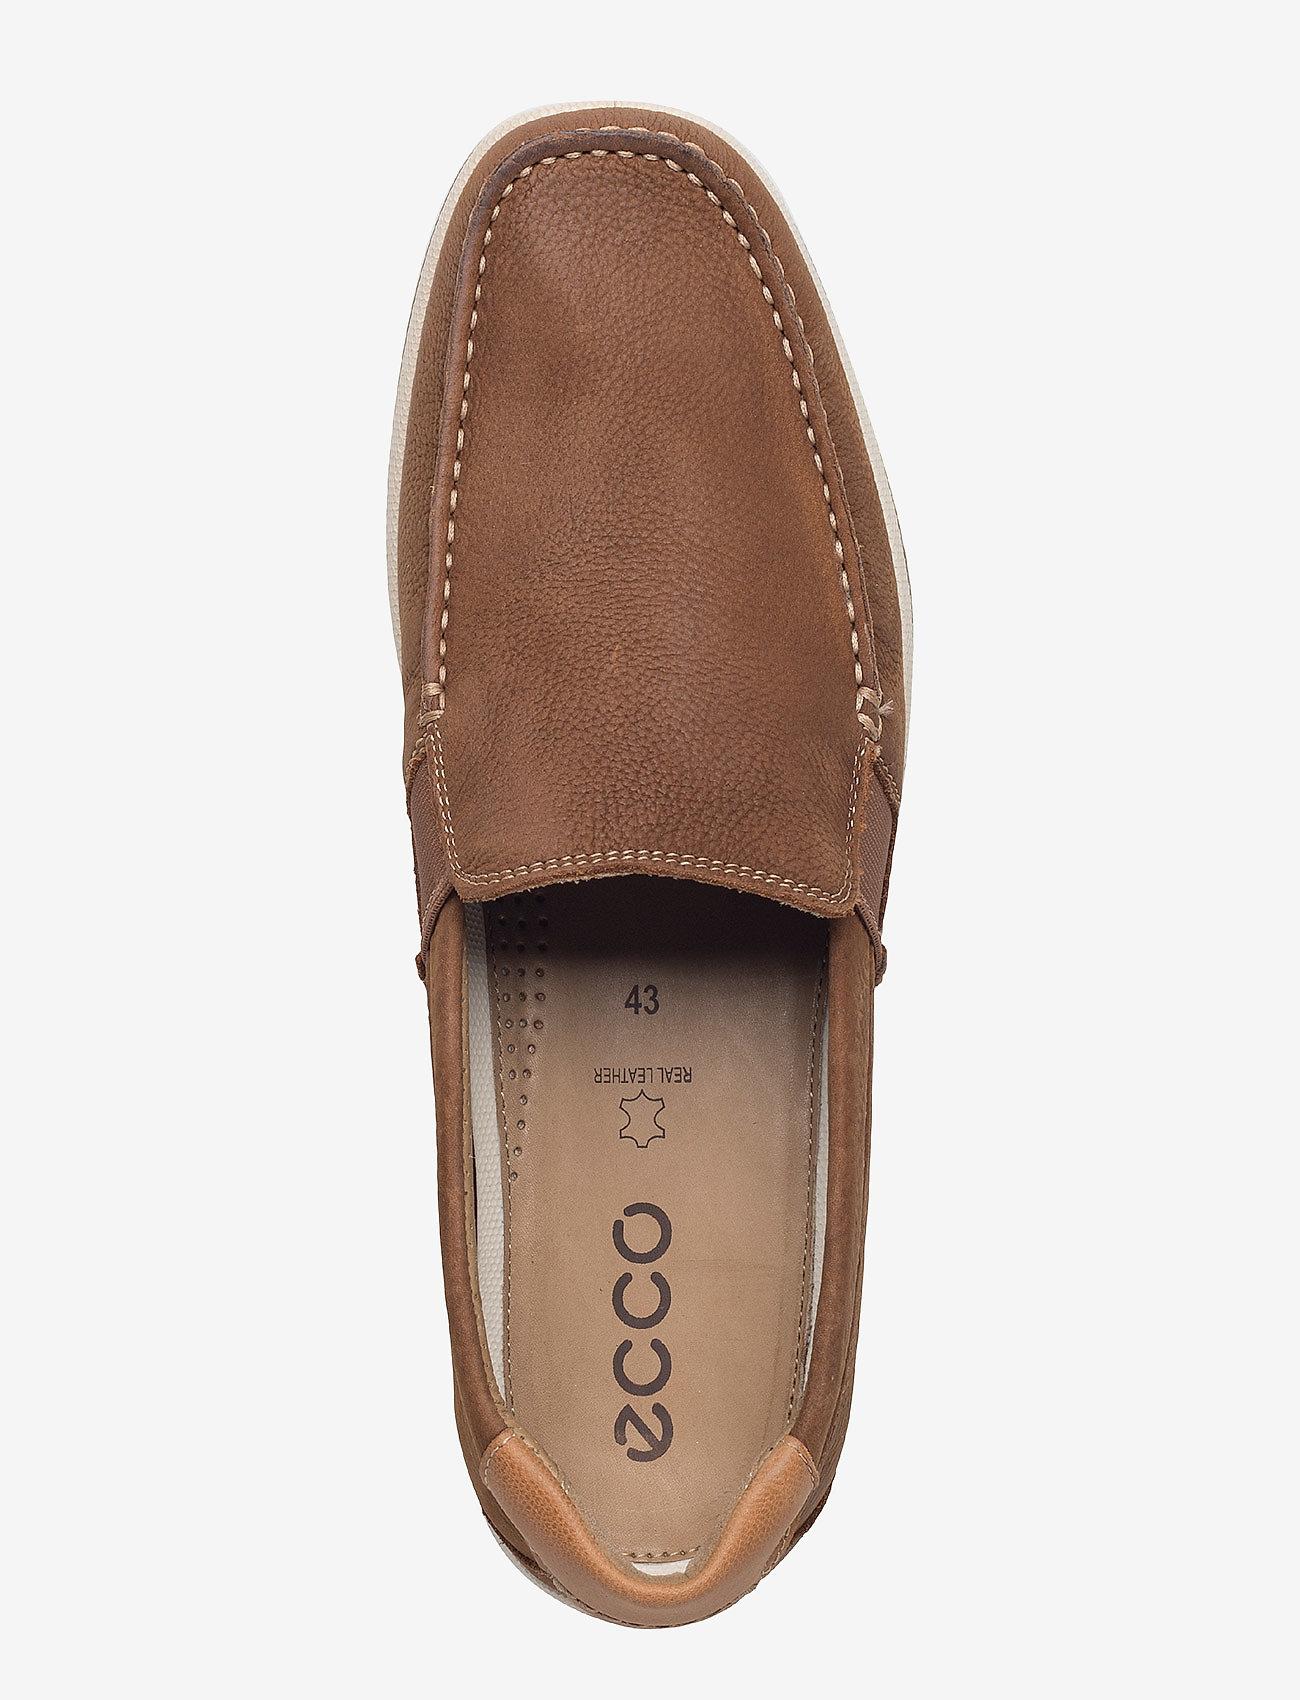 Reciprico (Mahogany) - ECCO